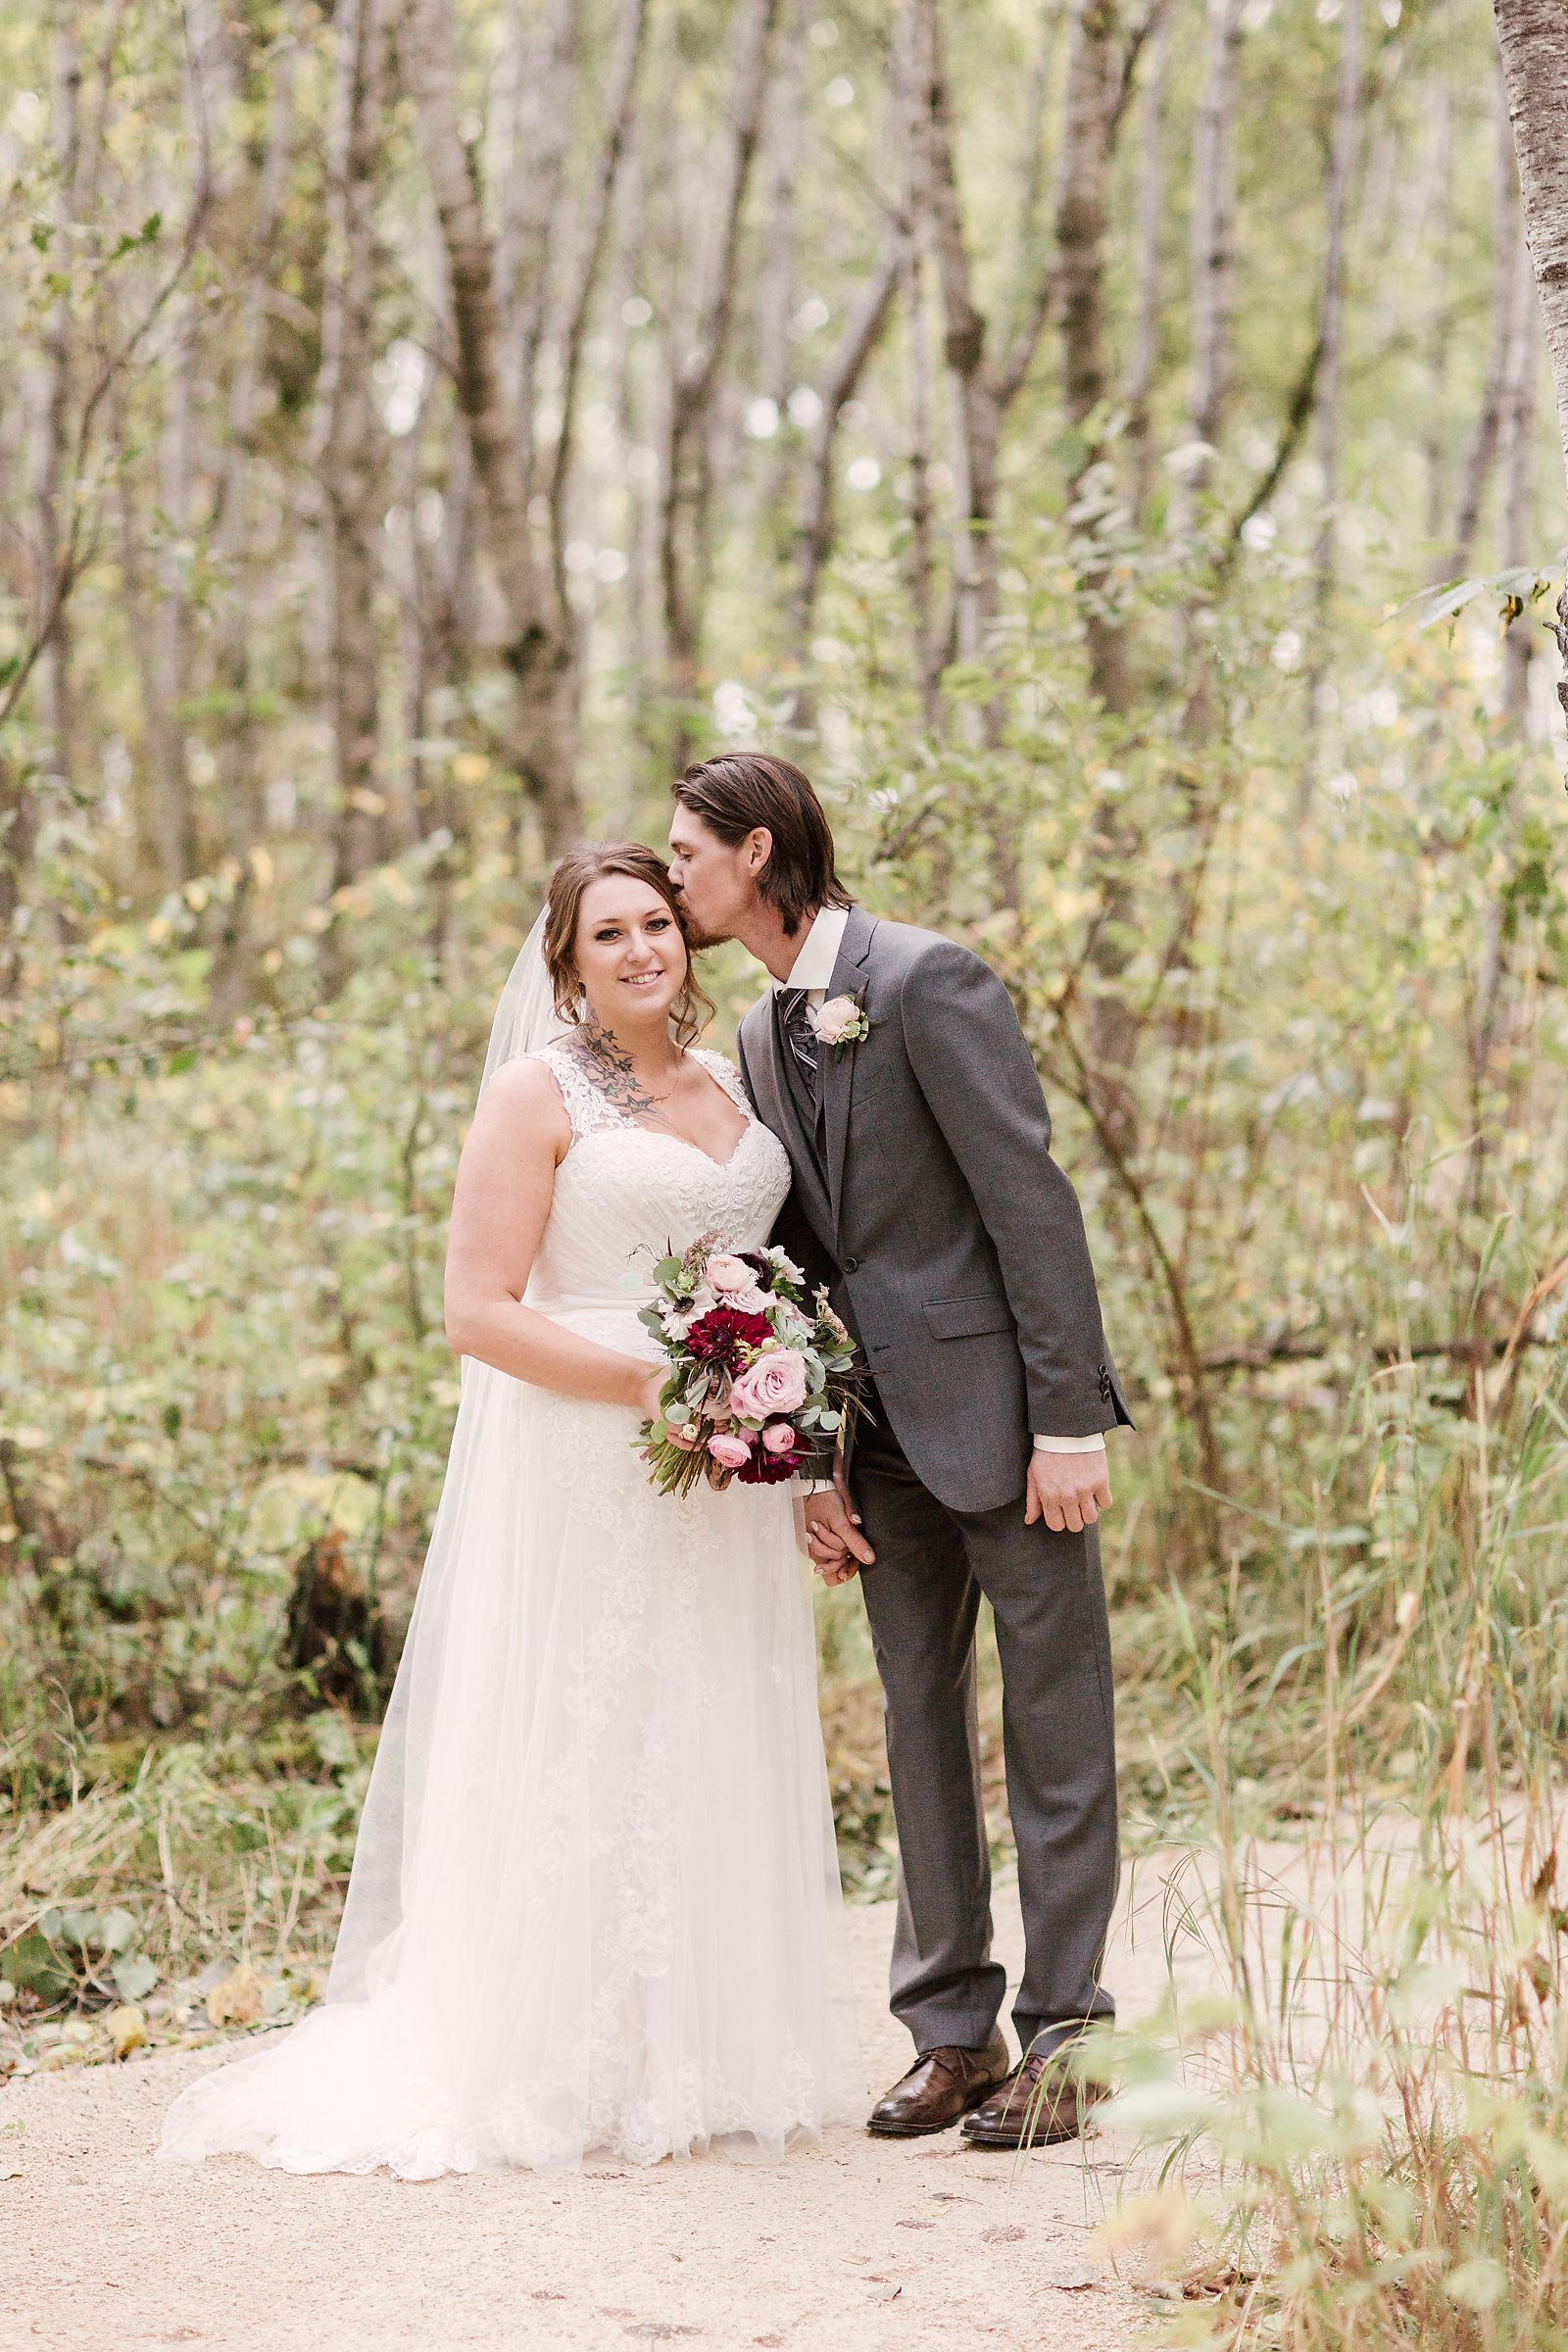 Outdoor Wedding Photos - Plum and Blush Wedding Flowers